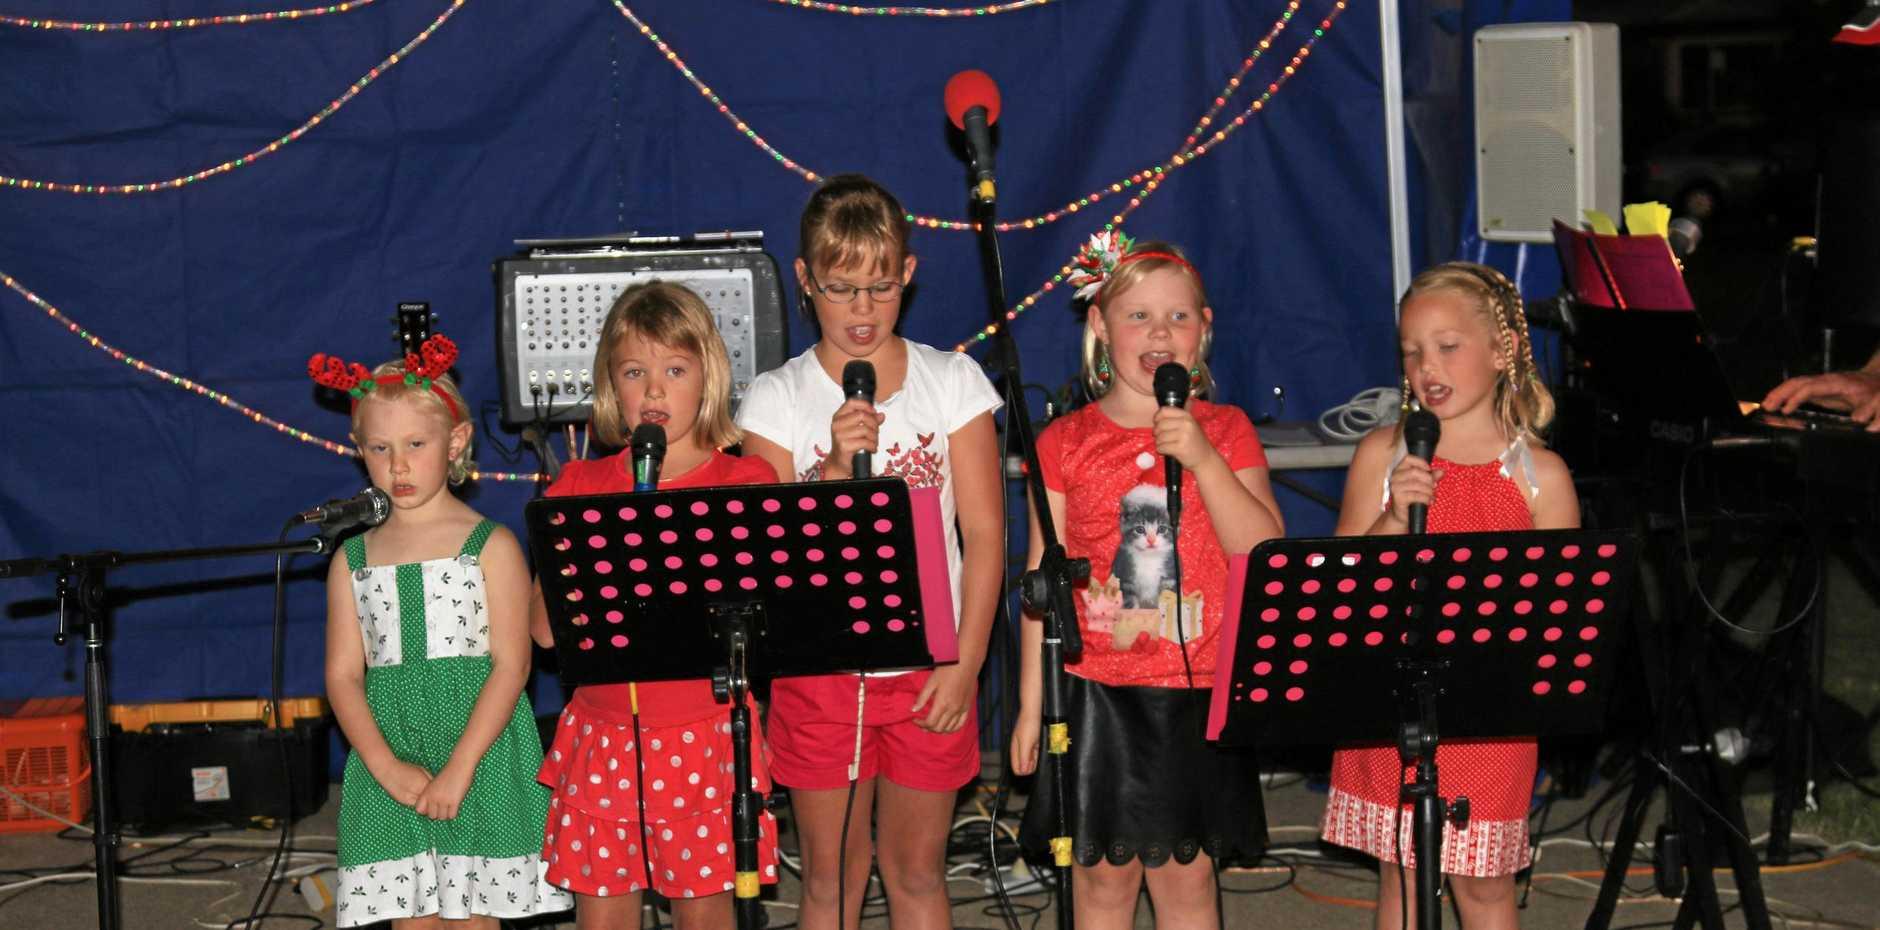 ABOVE: The Petersen Angels singing Christmas carols.